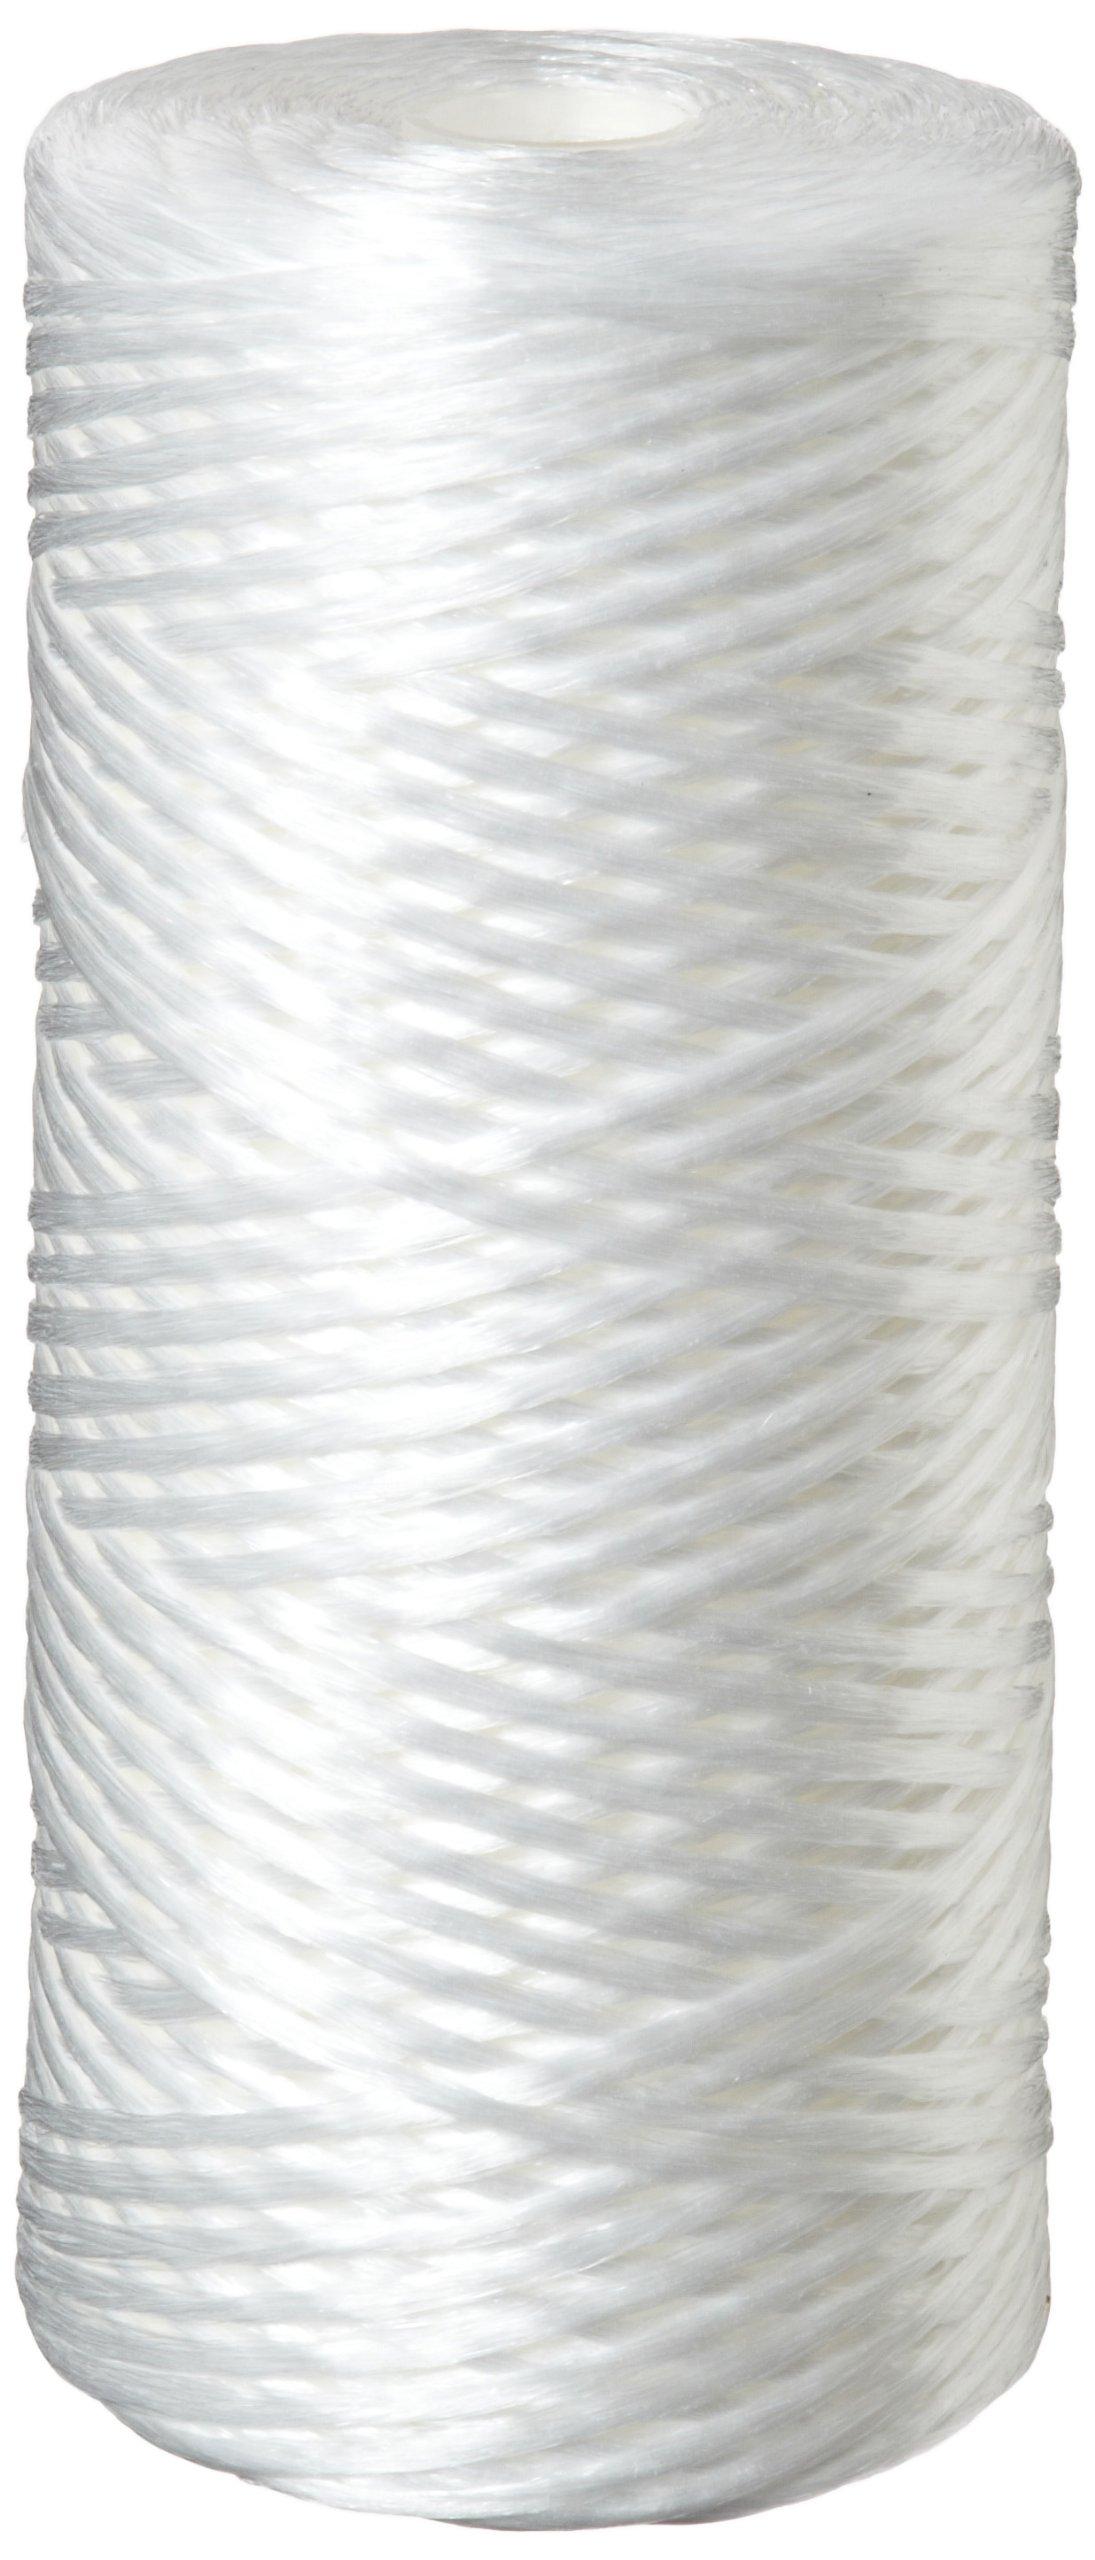 Pentek WPX5BB97P String-Wound Polypropylene Filter Cartridge, 10'' x 4.5'', 5 Microns